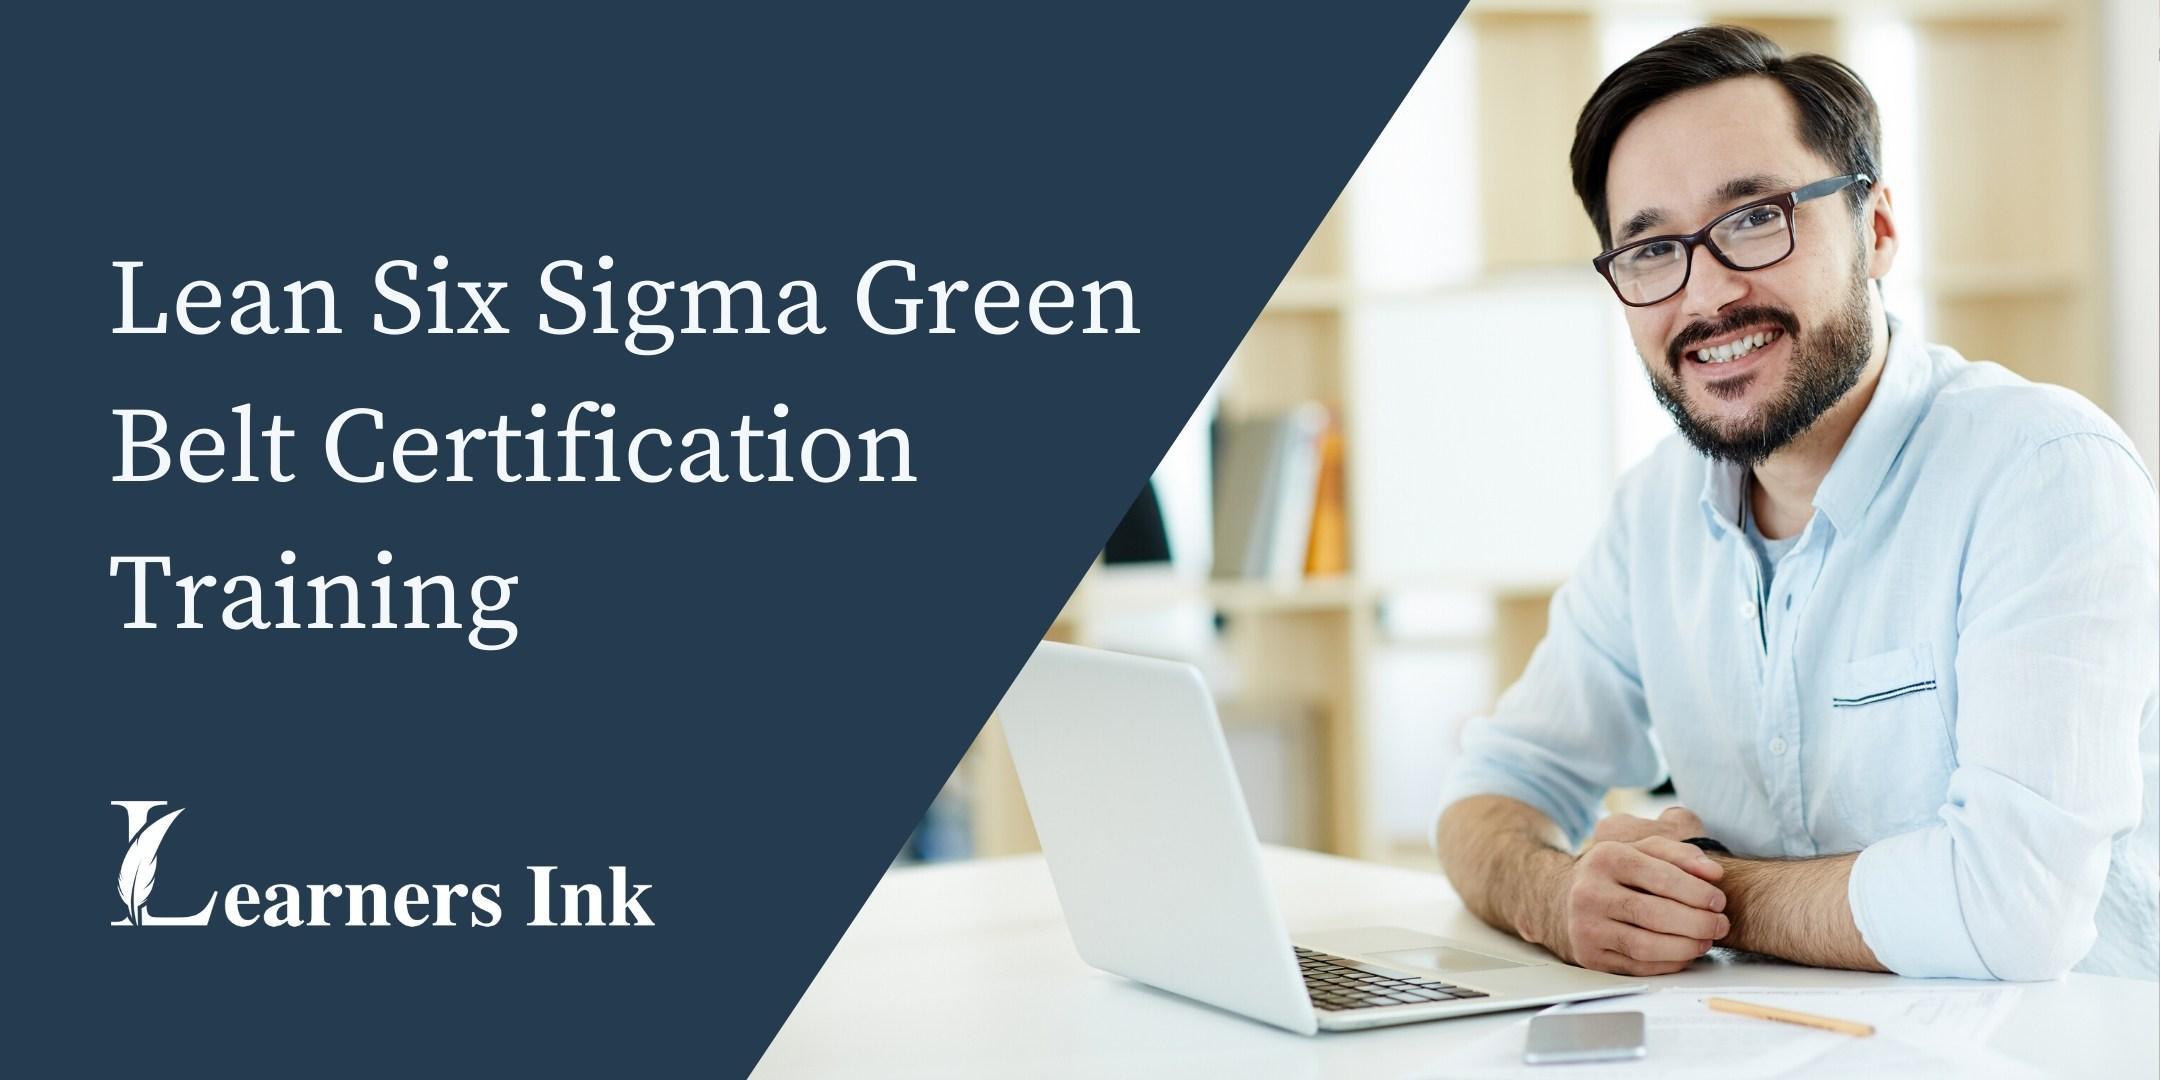 Lean Six Sigma Green Belt Certification Training Course (LSSGB) in Milton